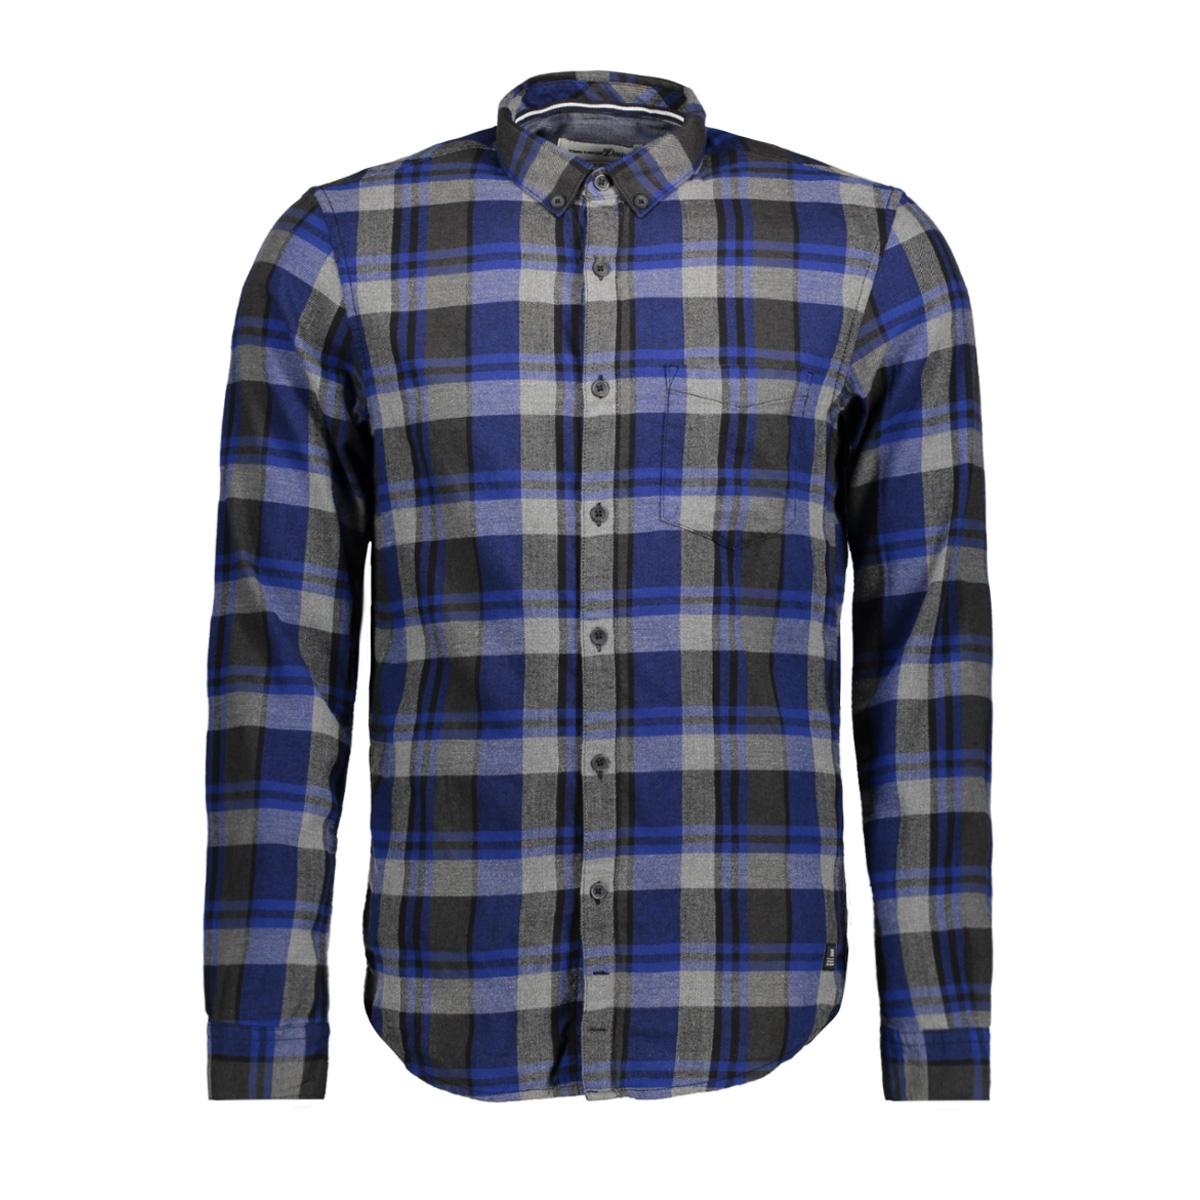 2055113.00.12 tom tailor overhemd 1000